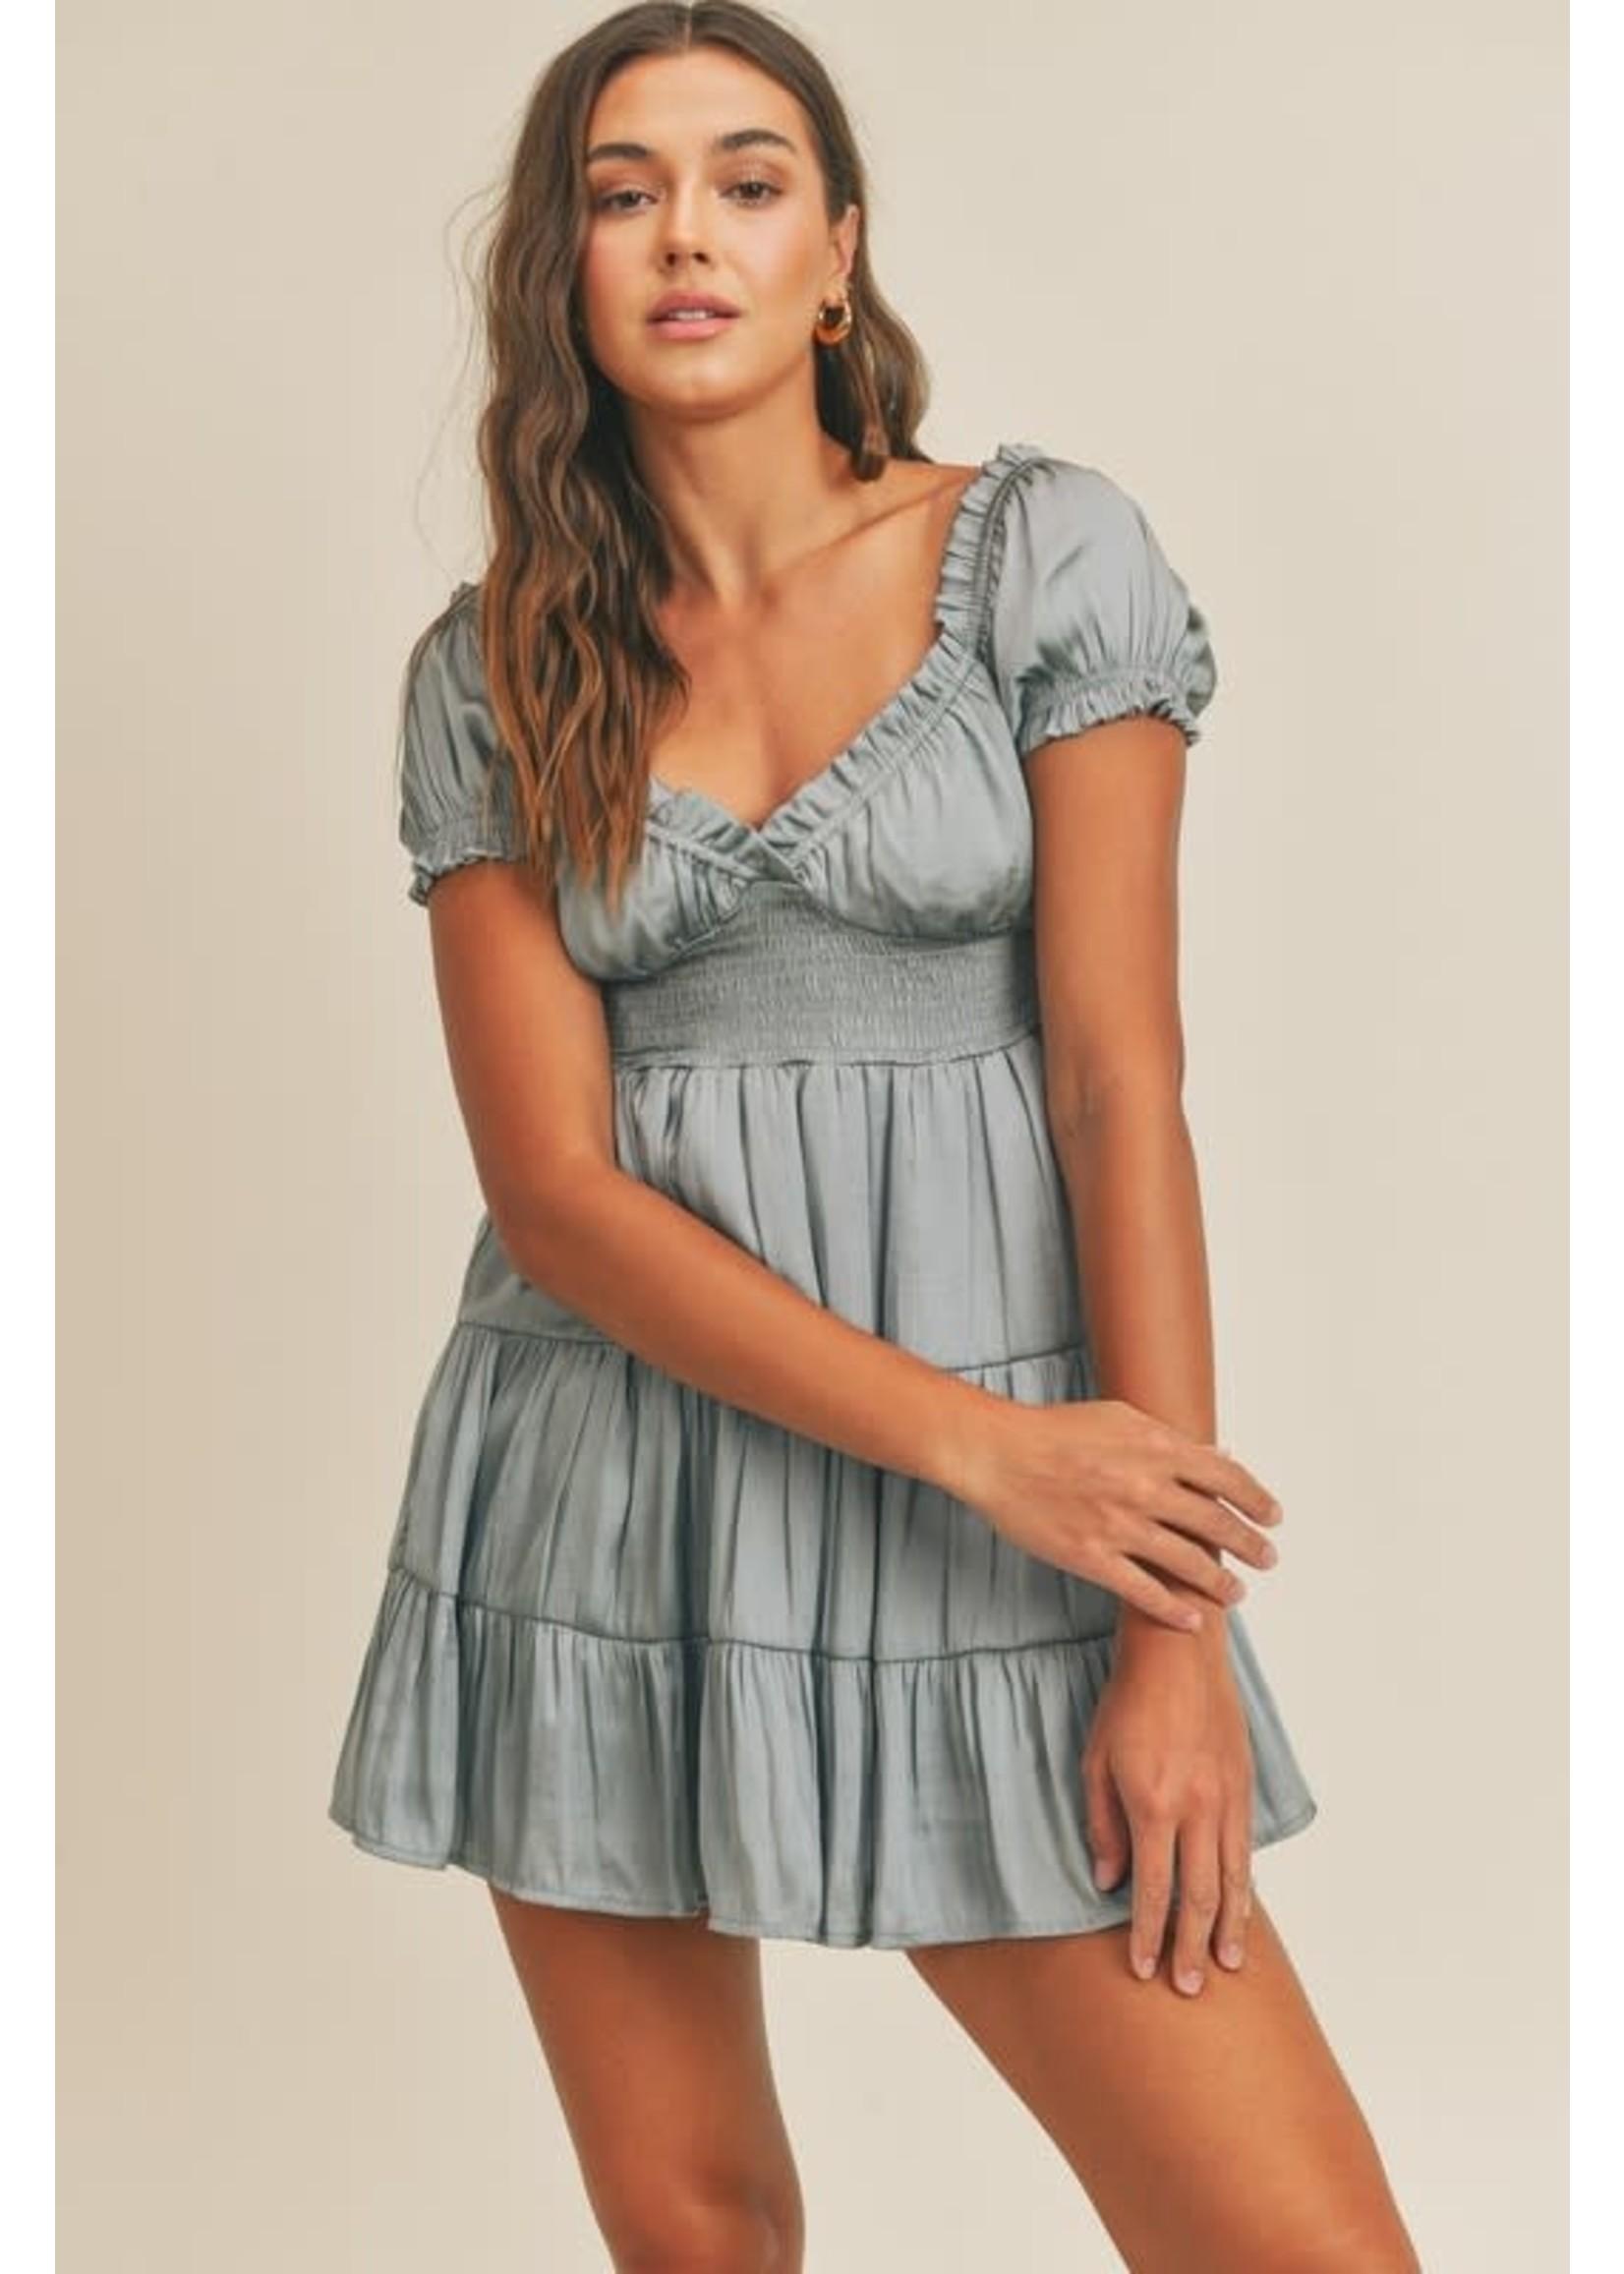 Mable Satiny Ruffled Babydoll Mini Dress - MD2763A